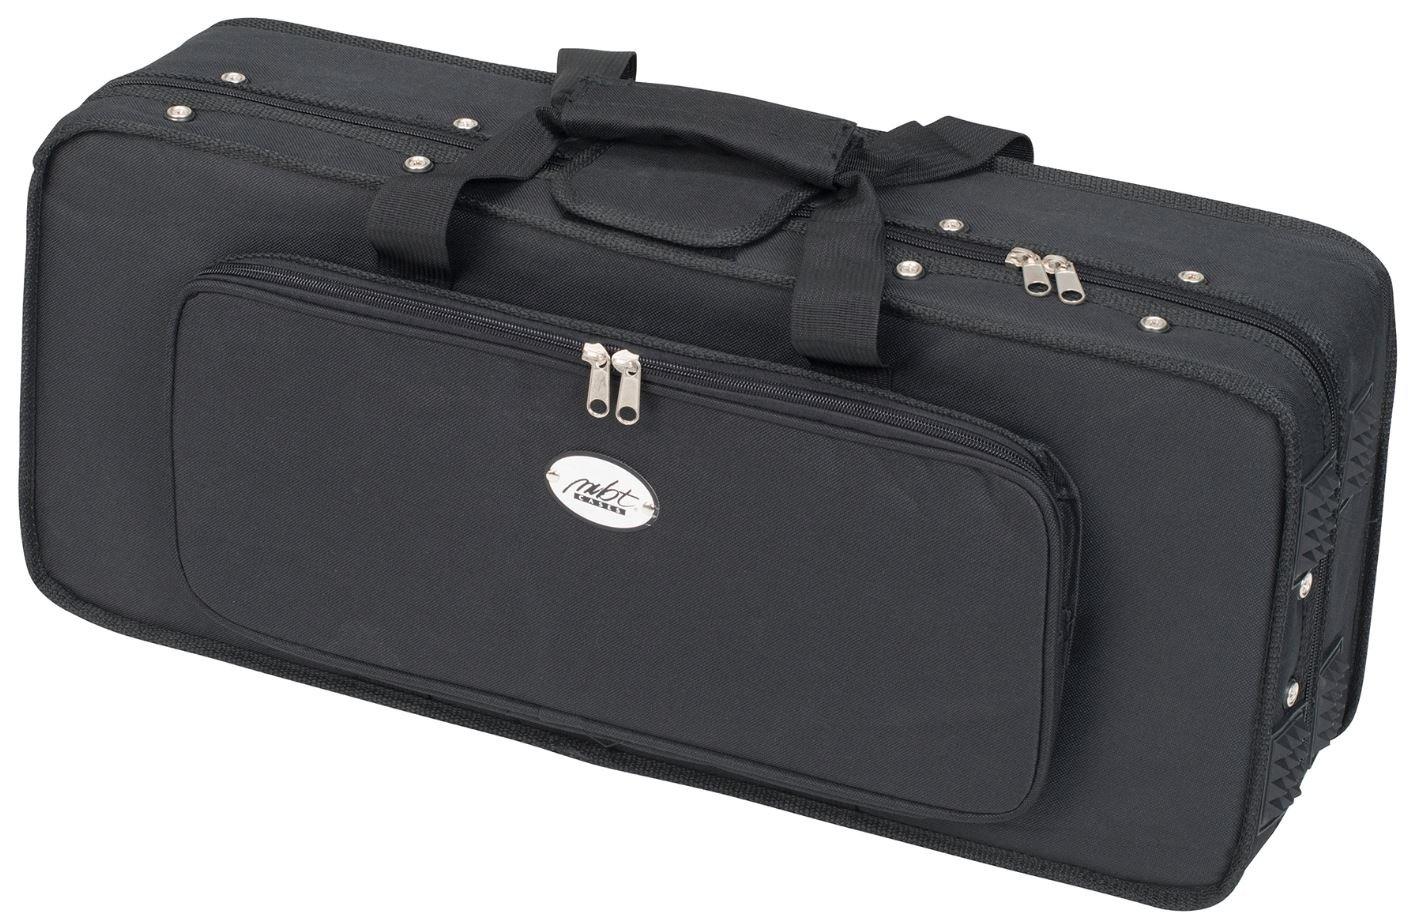 MBT MBTASP Polyfoam Alto Saxophone Case KMC Music Inc